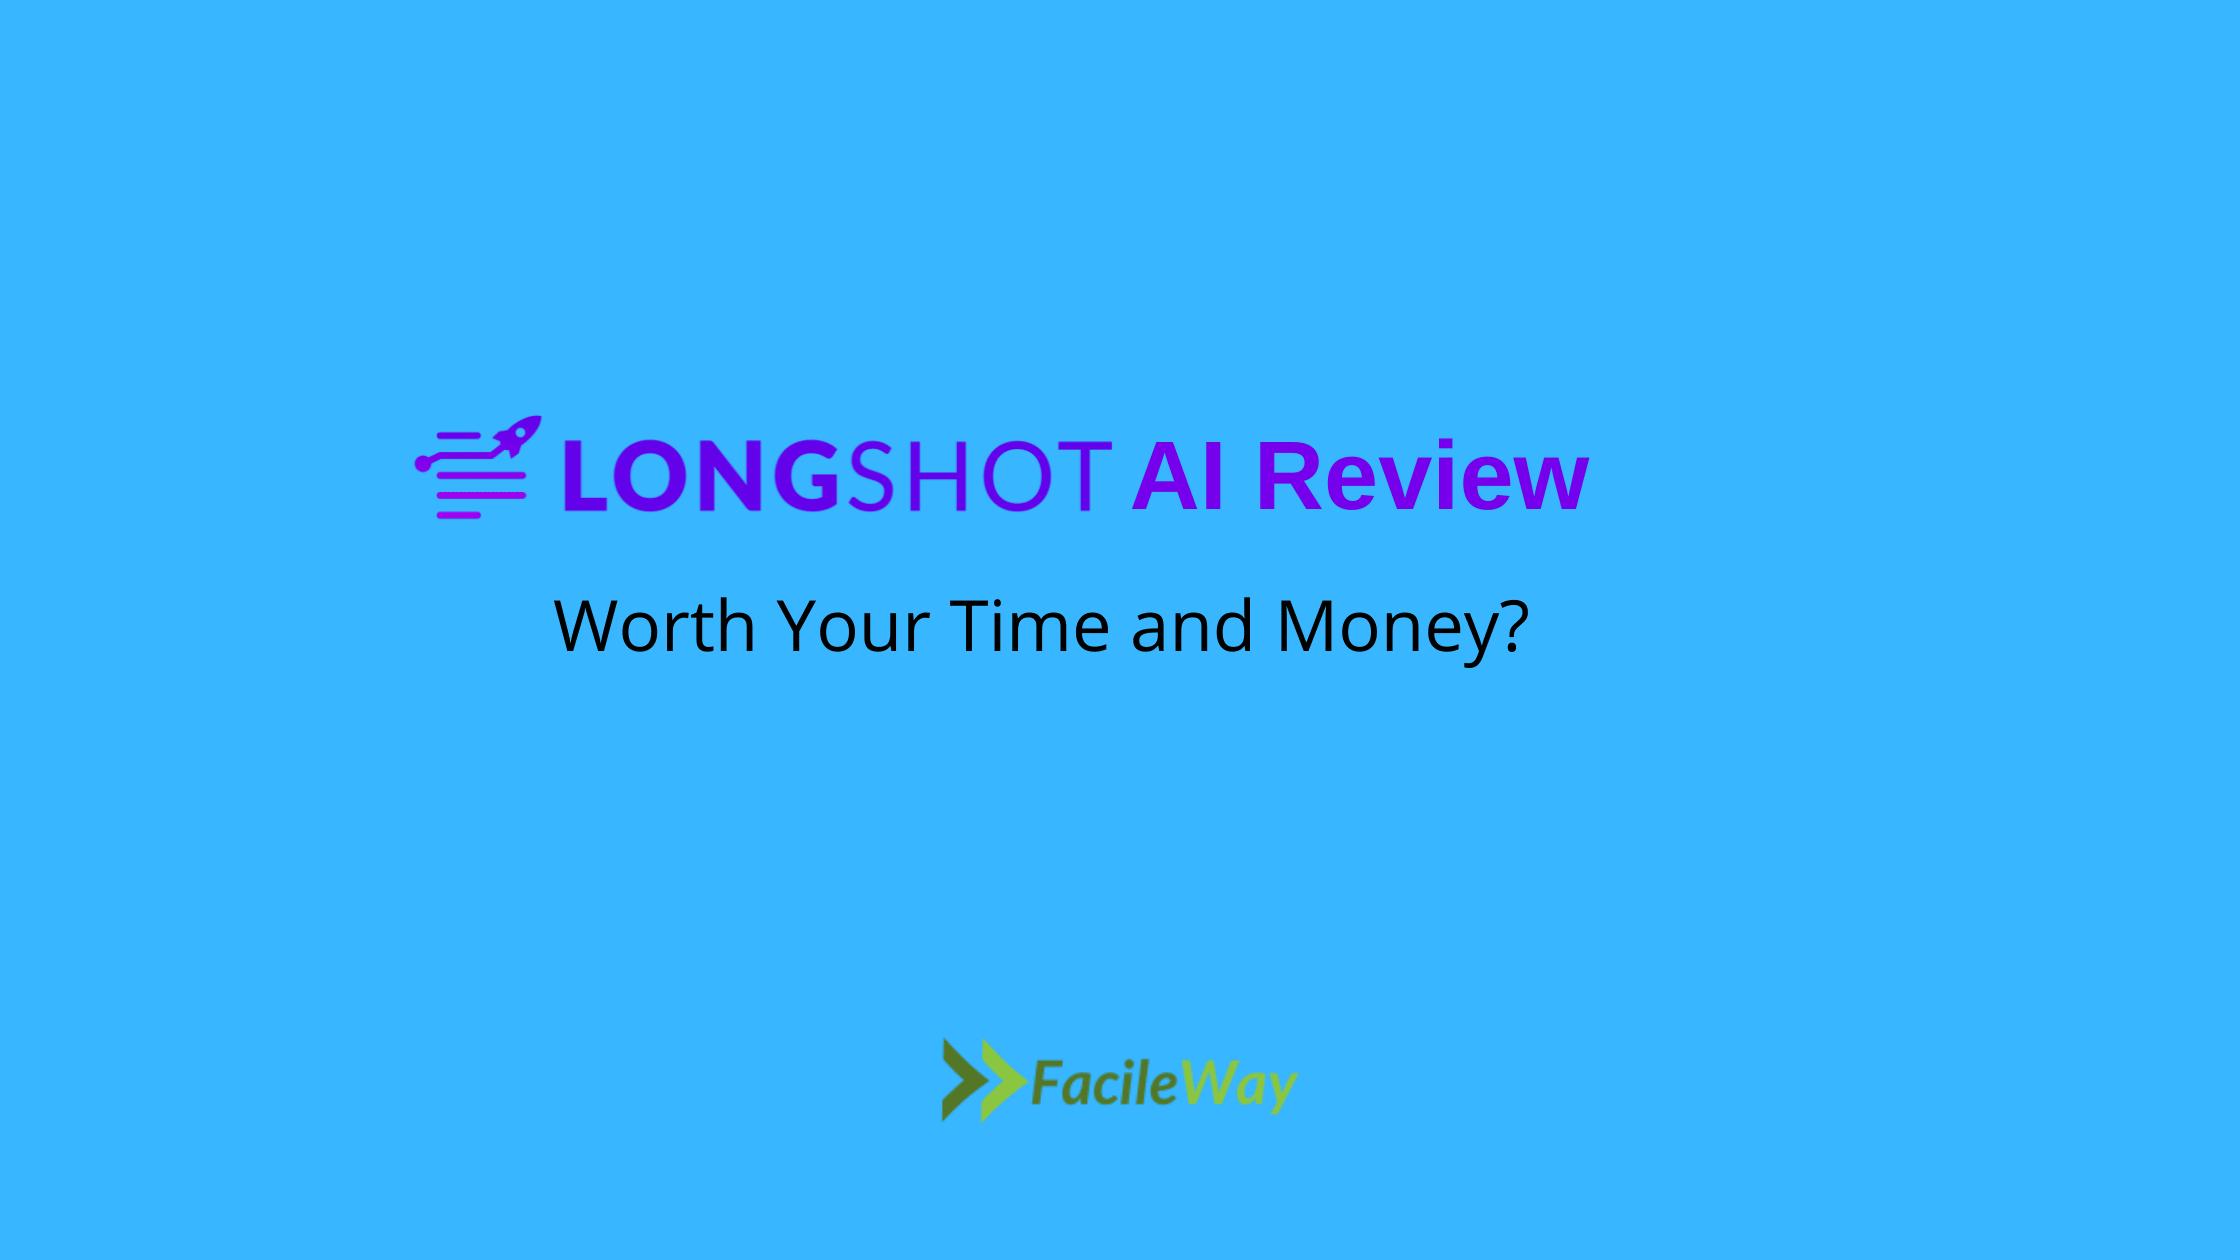 Longshot AI Review